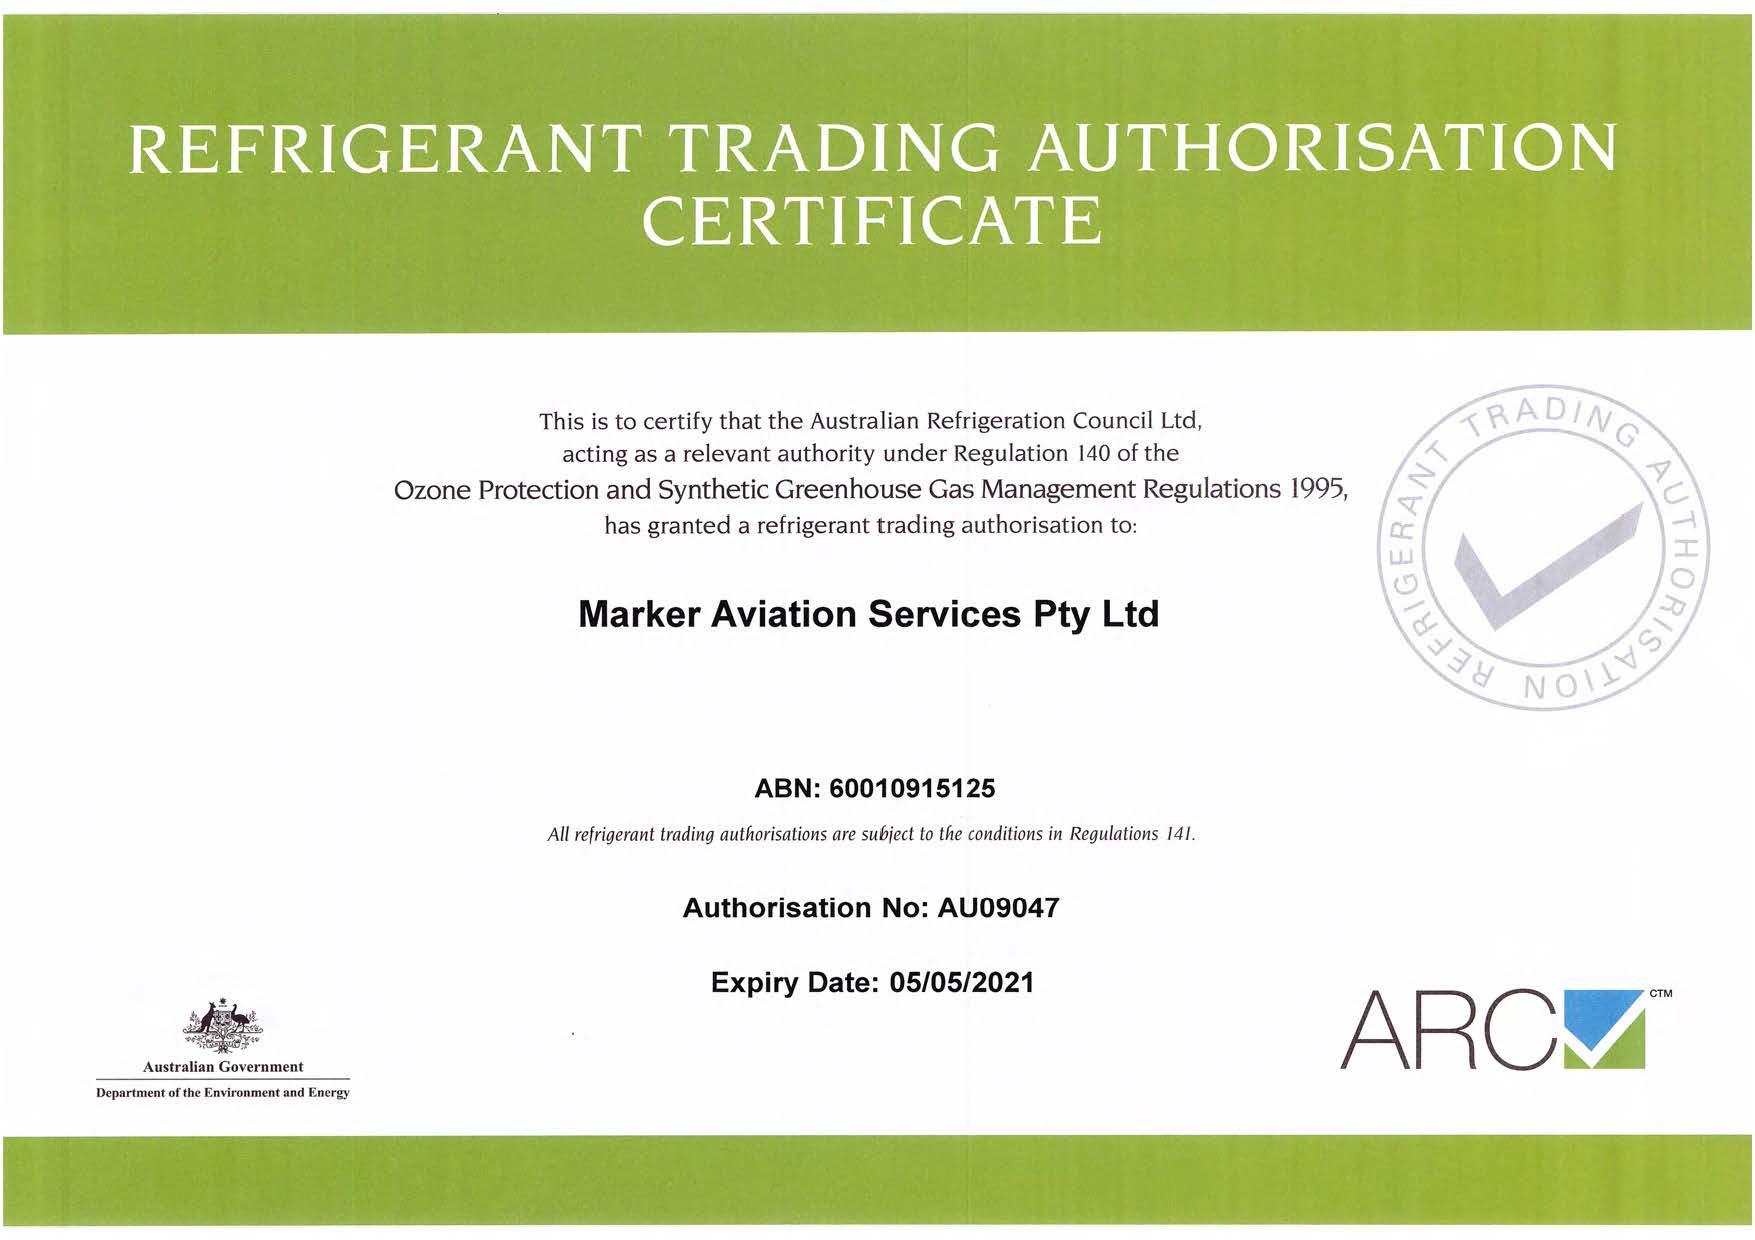 Refrigerant Trading Authorisation Certificate Expiry 05052021